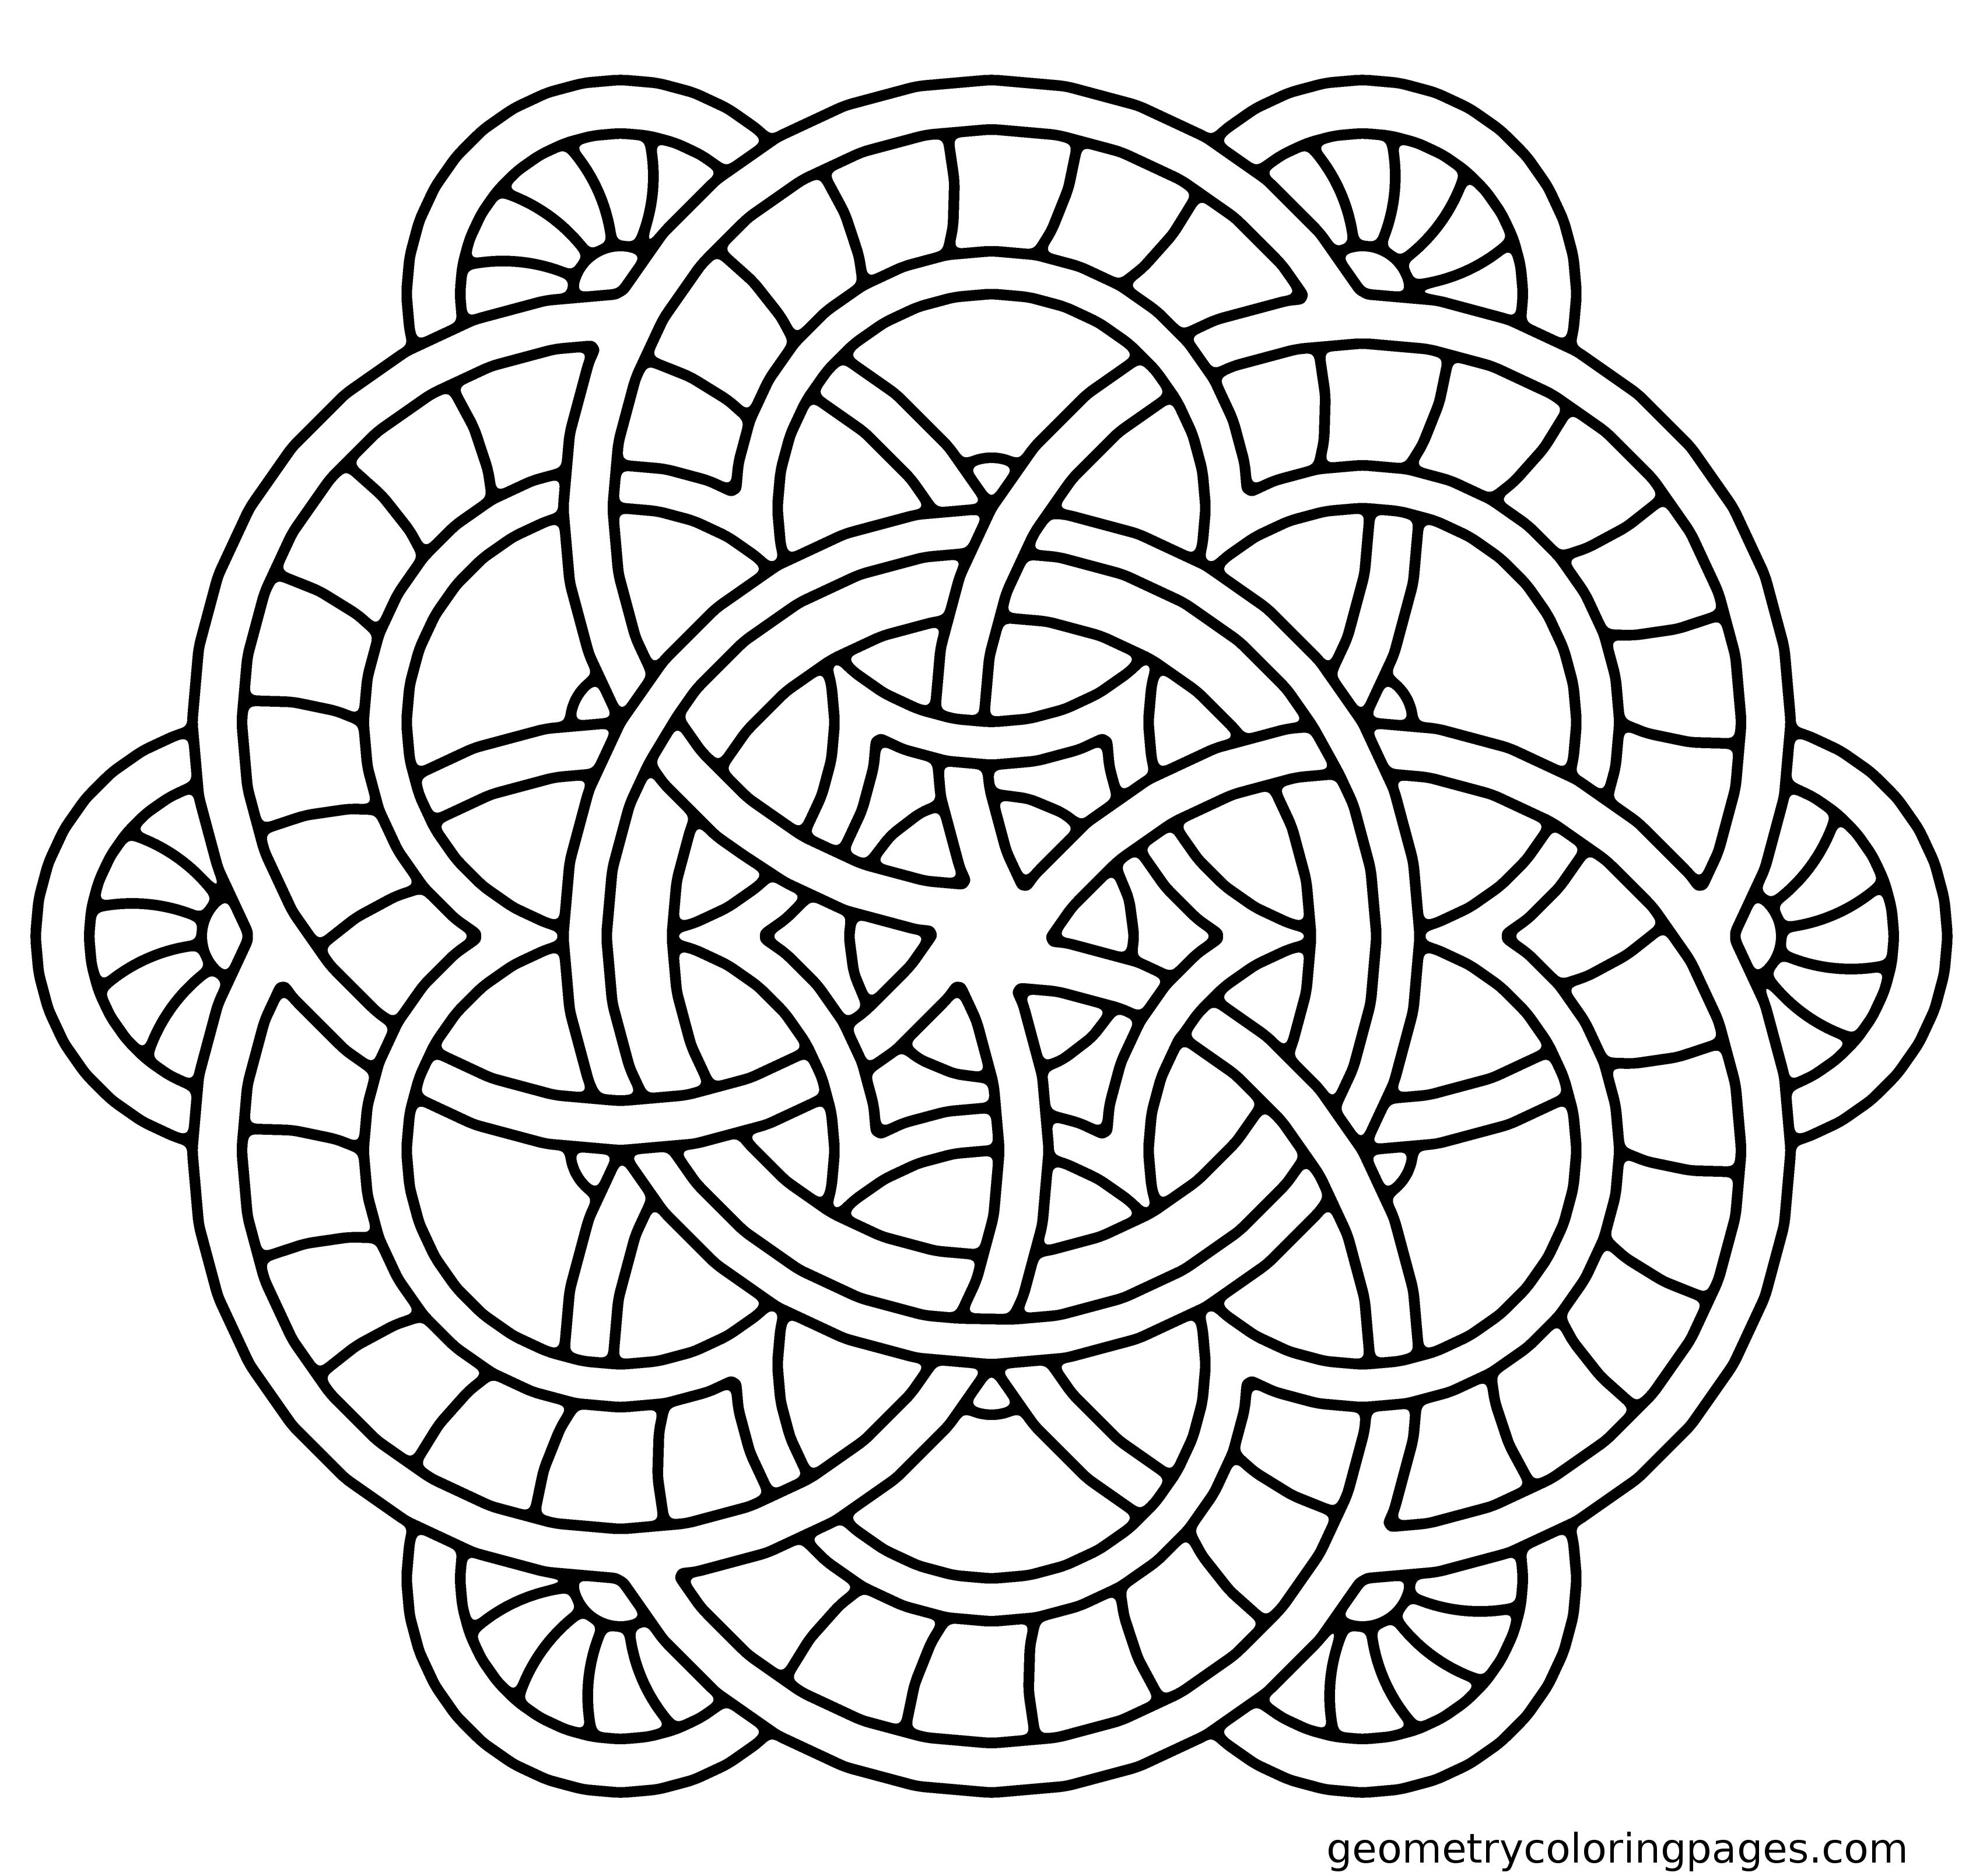 3400x3217 Mandala Coloring Pages Free Printable